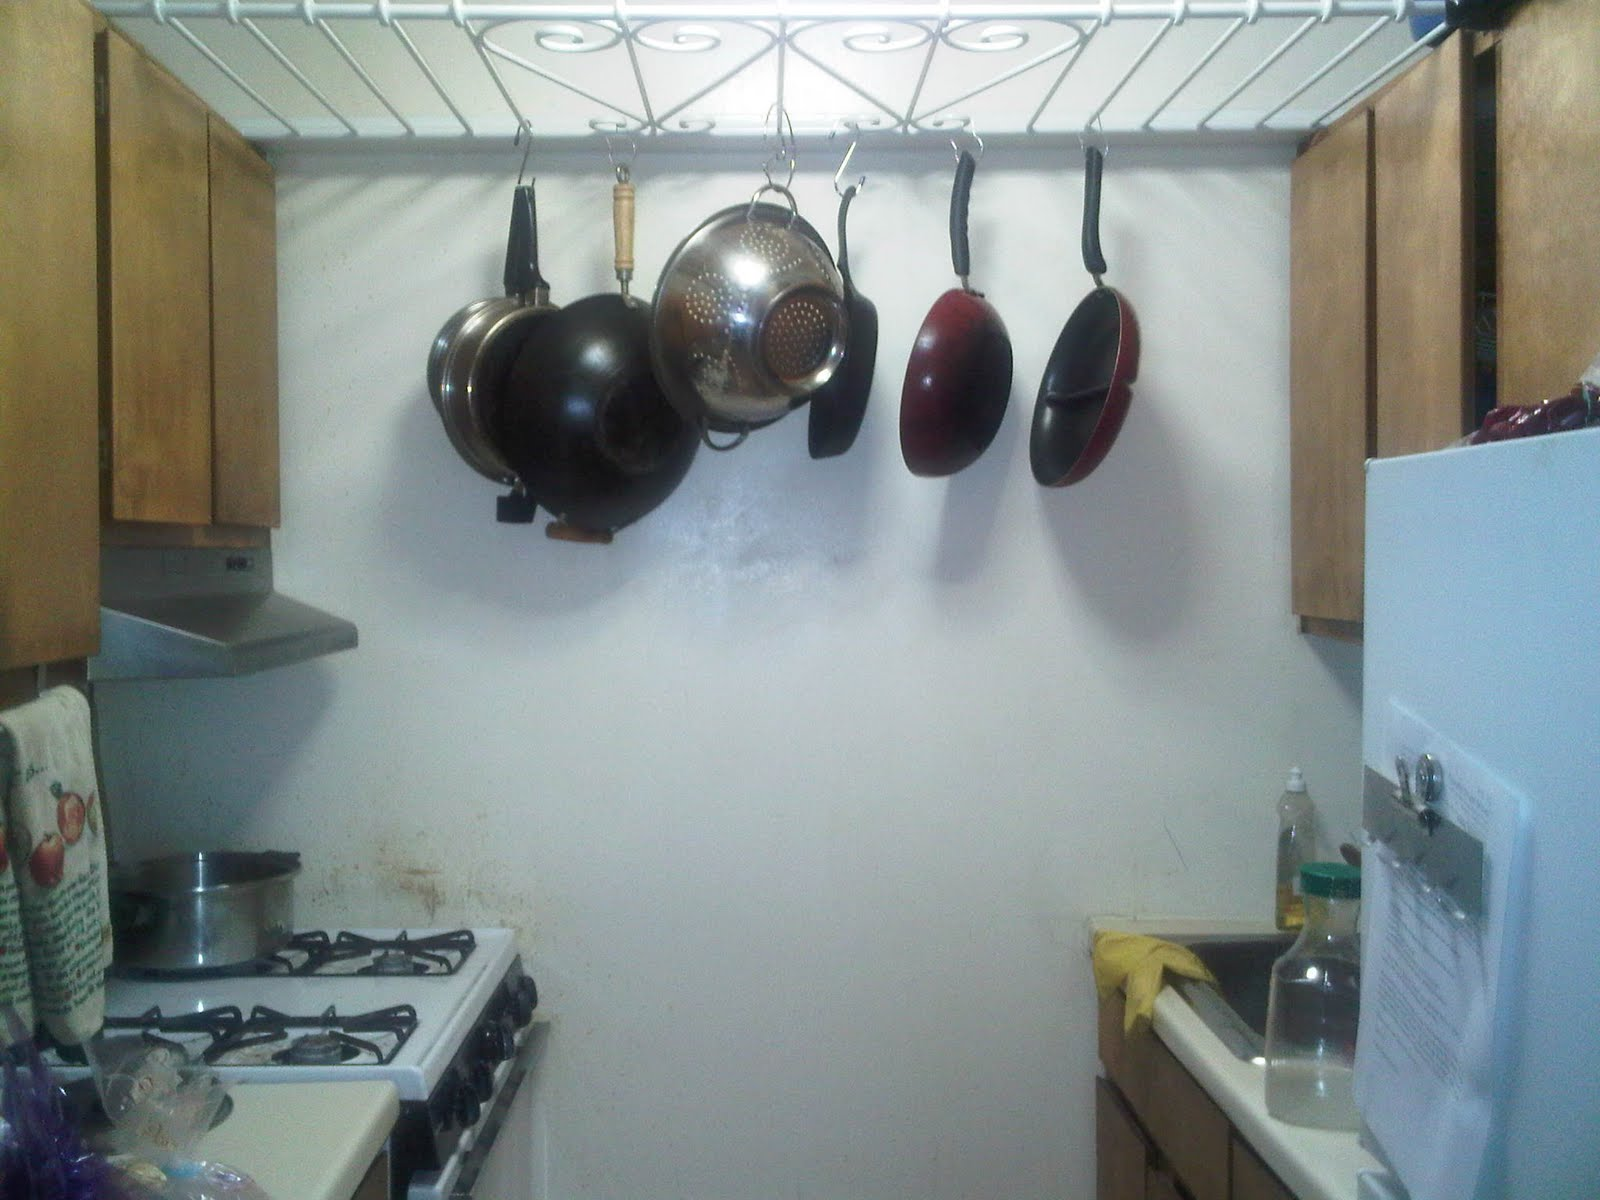 1000+ images about Pot Racks on Pinterest | Pot racks ...